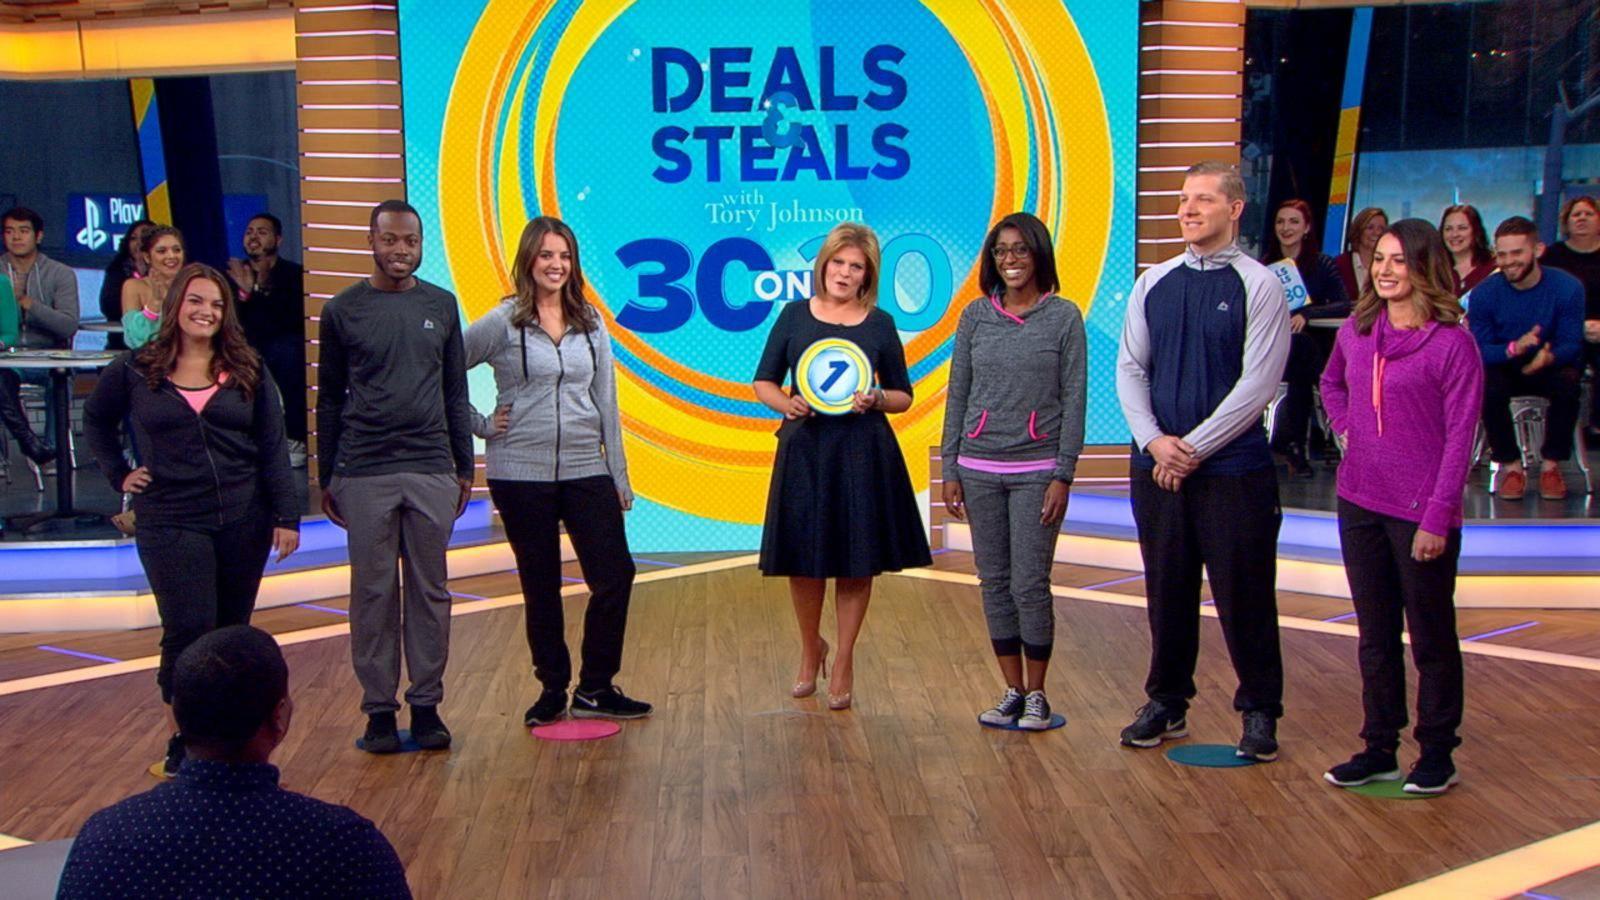 VIDEO: Deals and Steals: 30 Deals on September 30